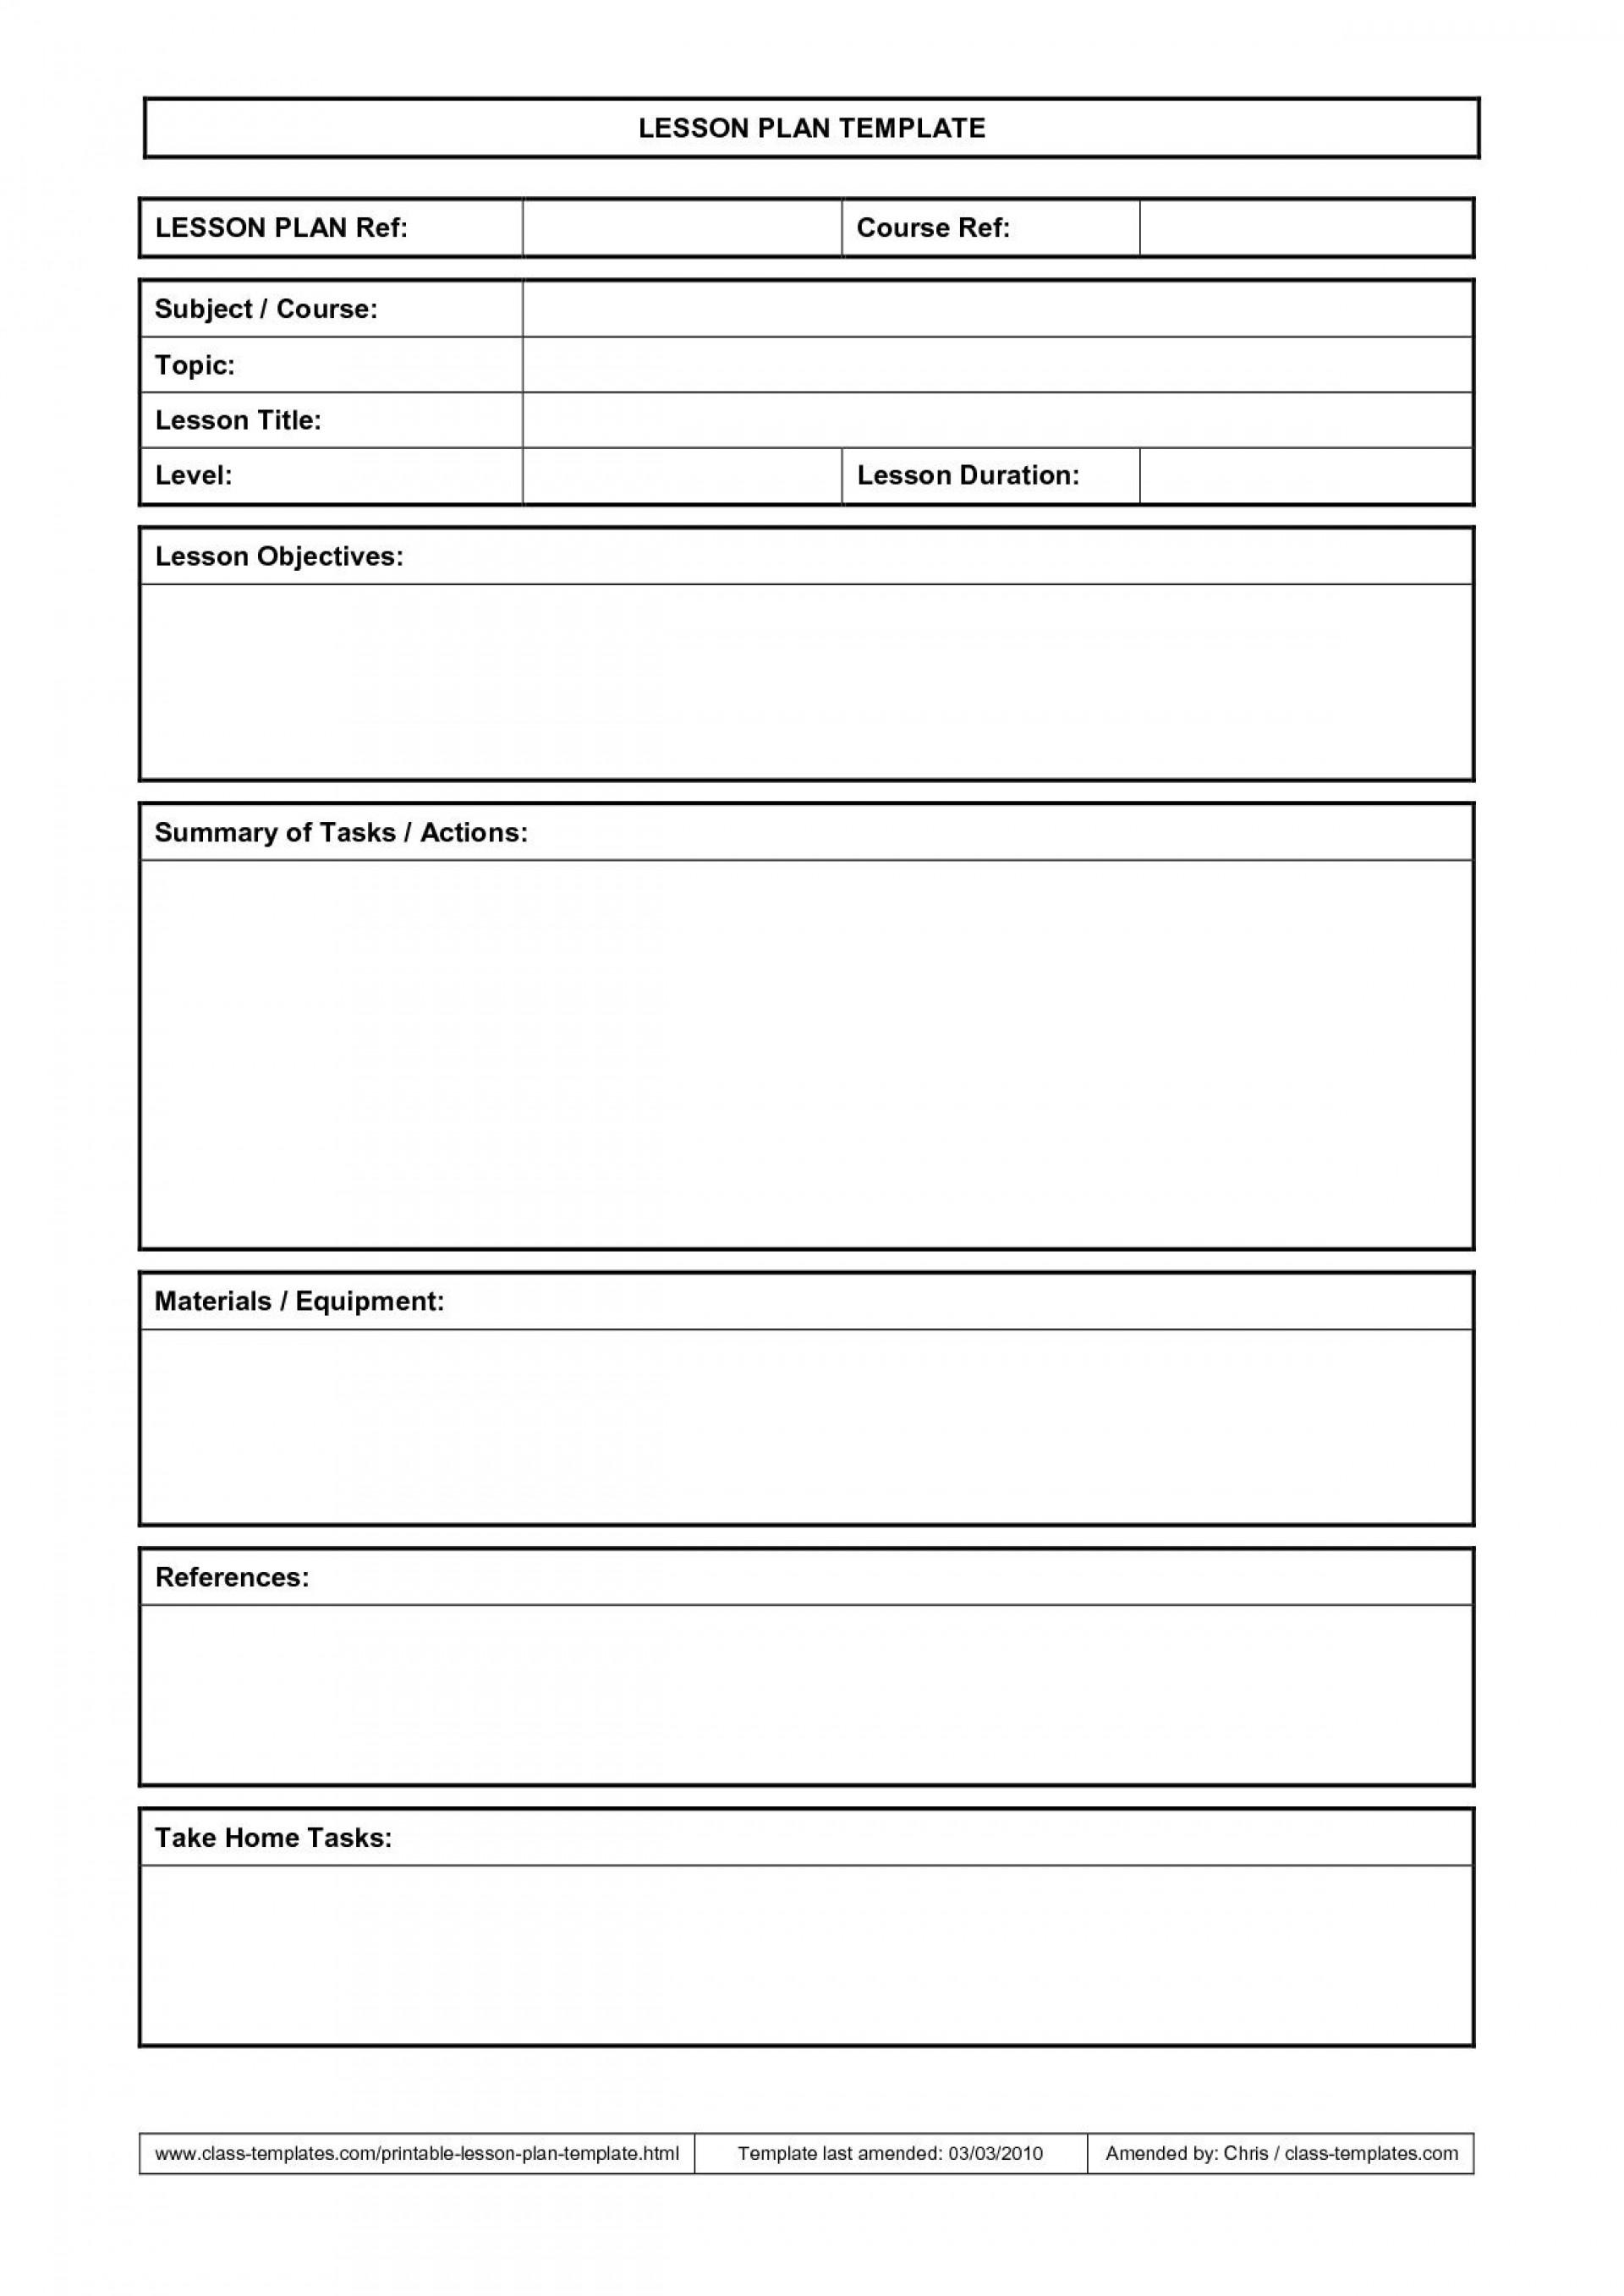 001 Top Free Lesson Plan Template Word High Definition  Preschool Doc1920